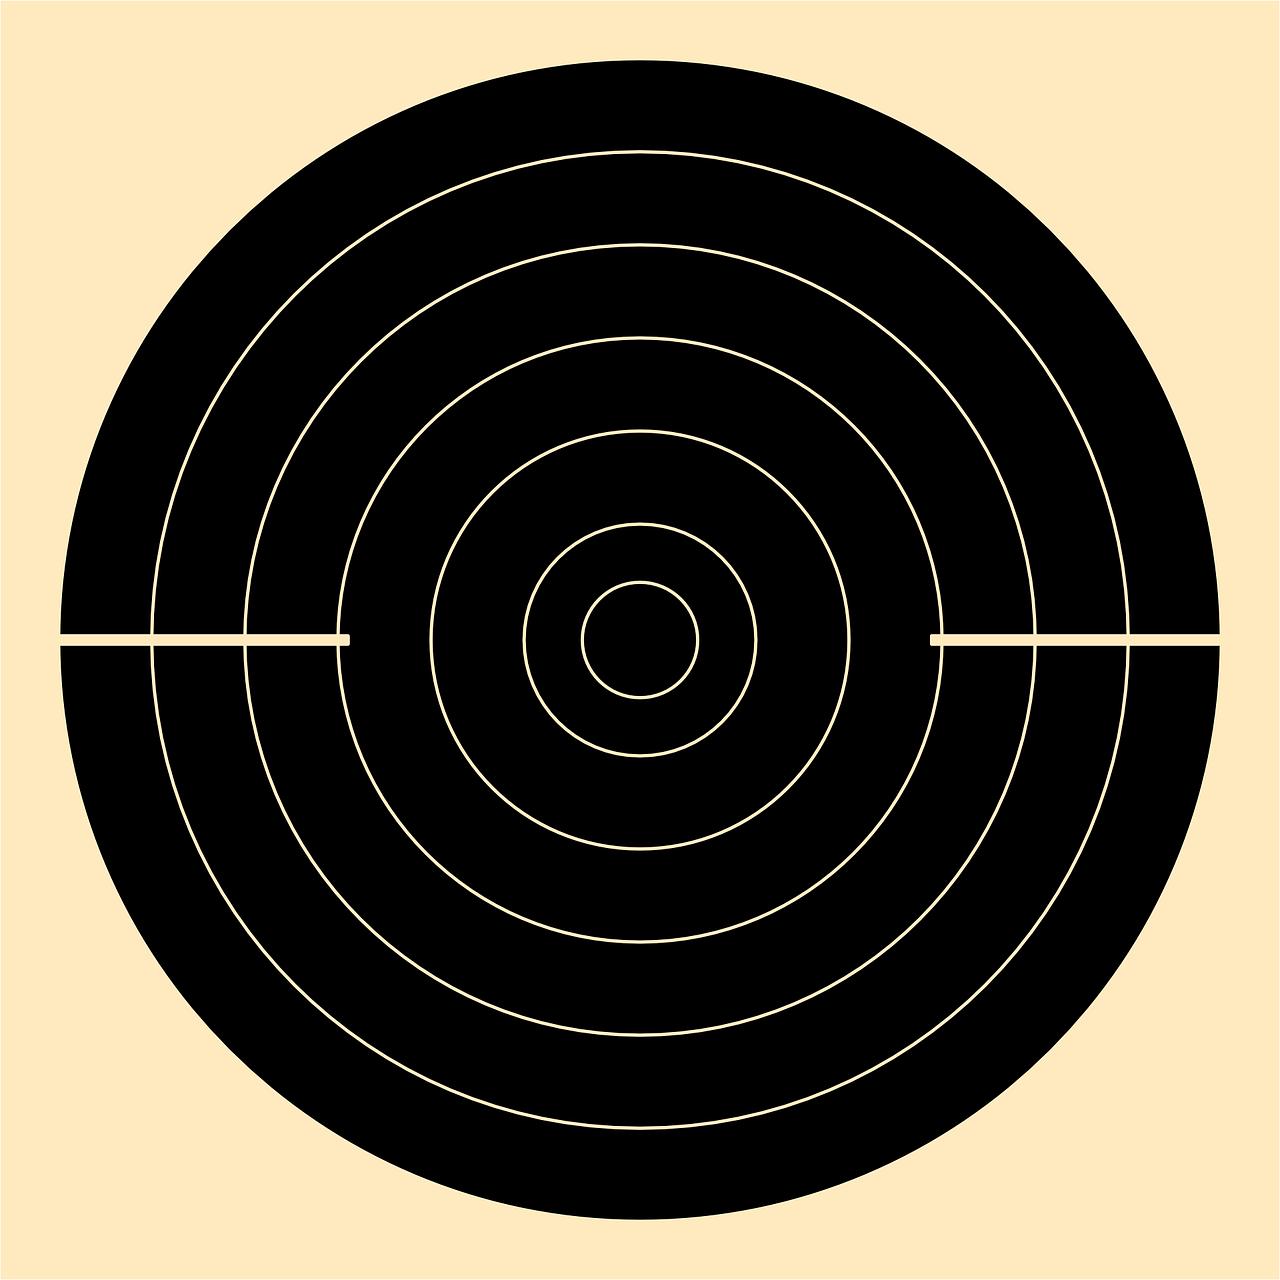 Pistol,target,butt,object,shoot - free photo from needpix com